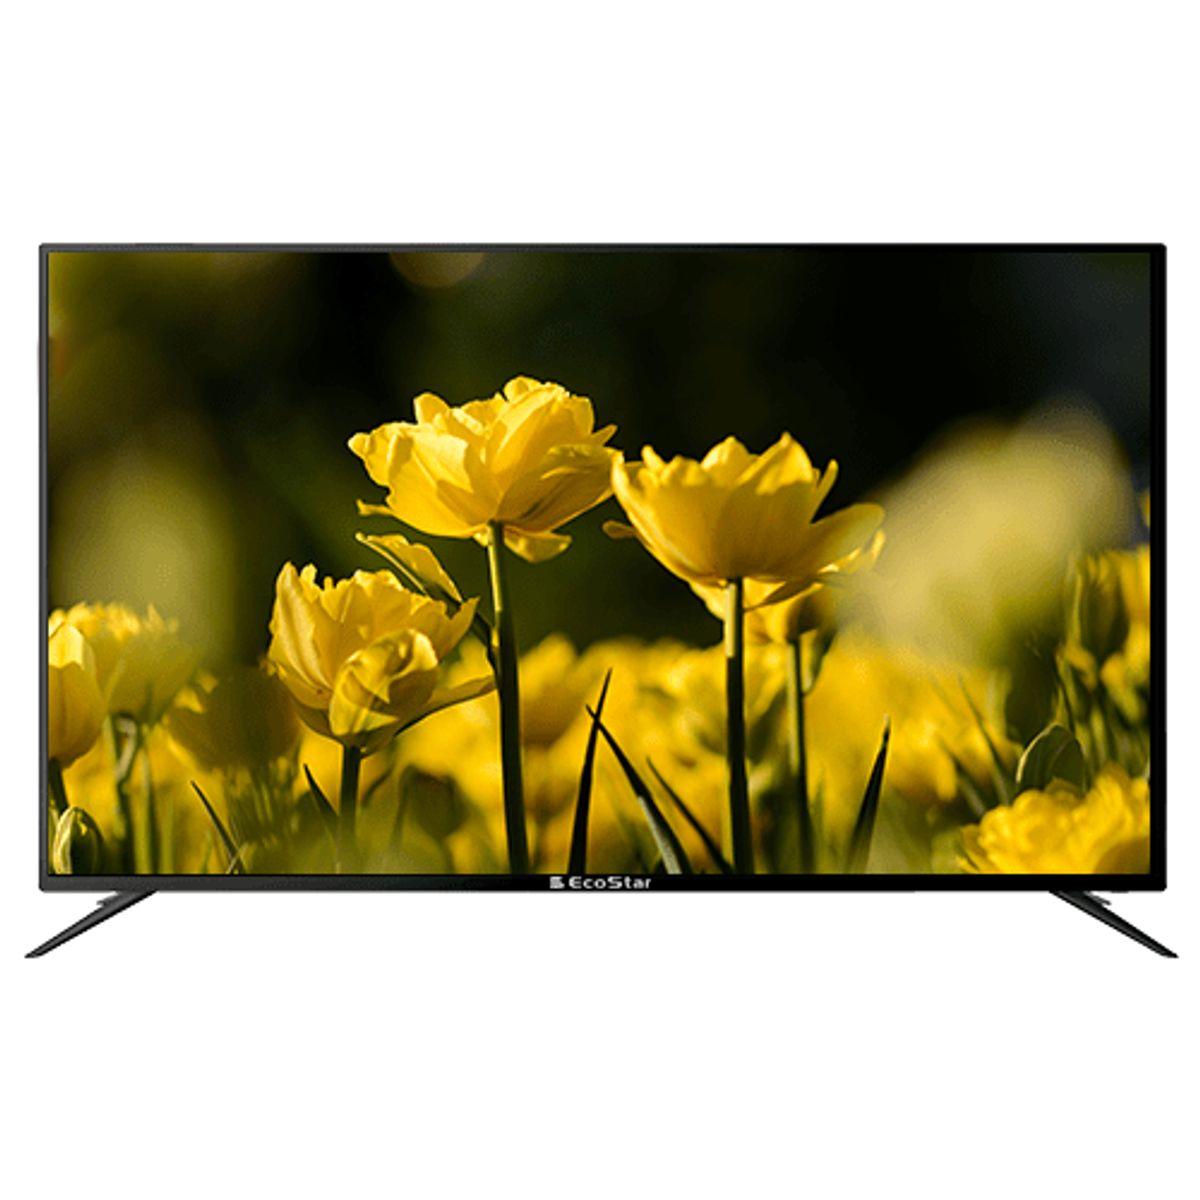 EcoStar 65 Inch HD Smart LED TV (65UD951)